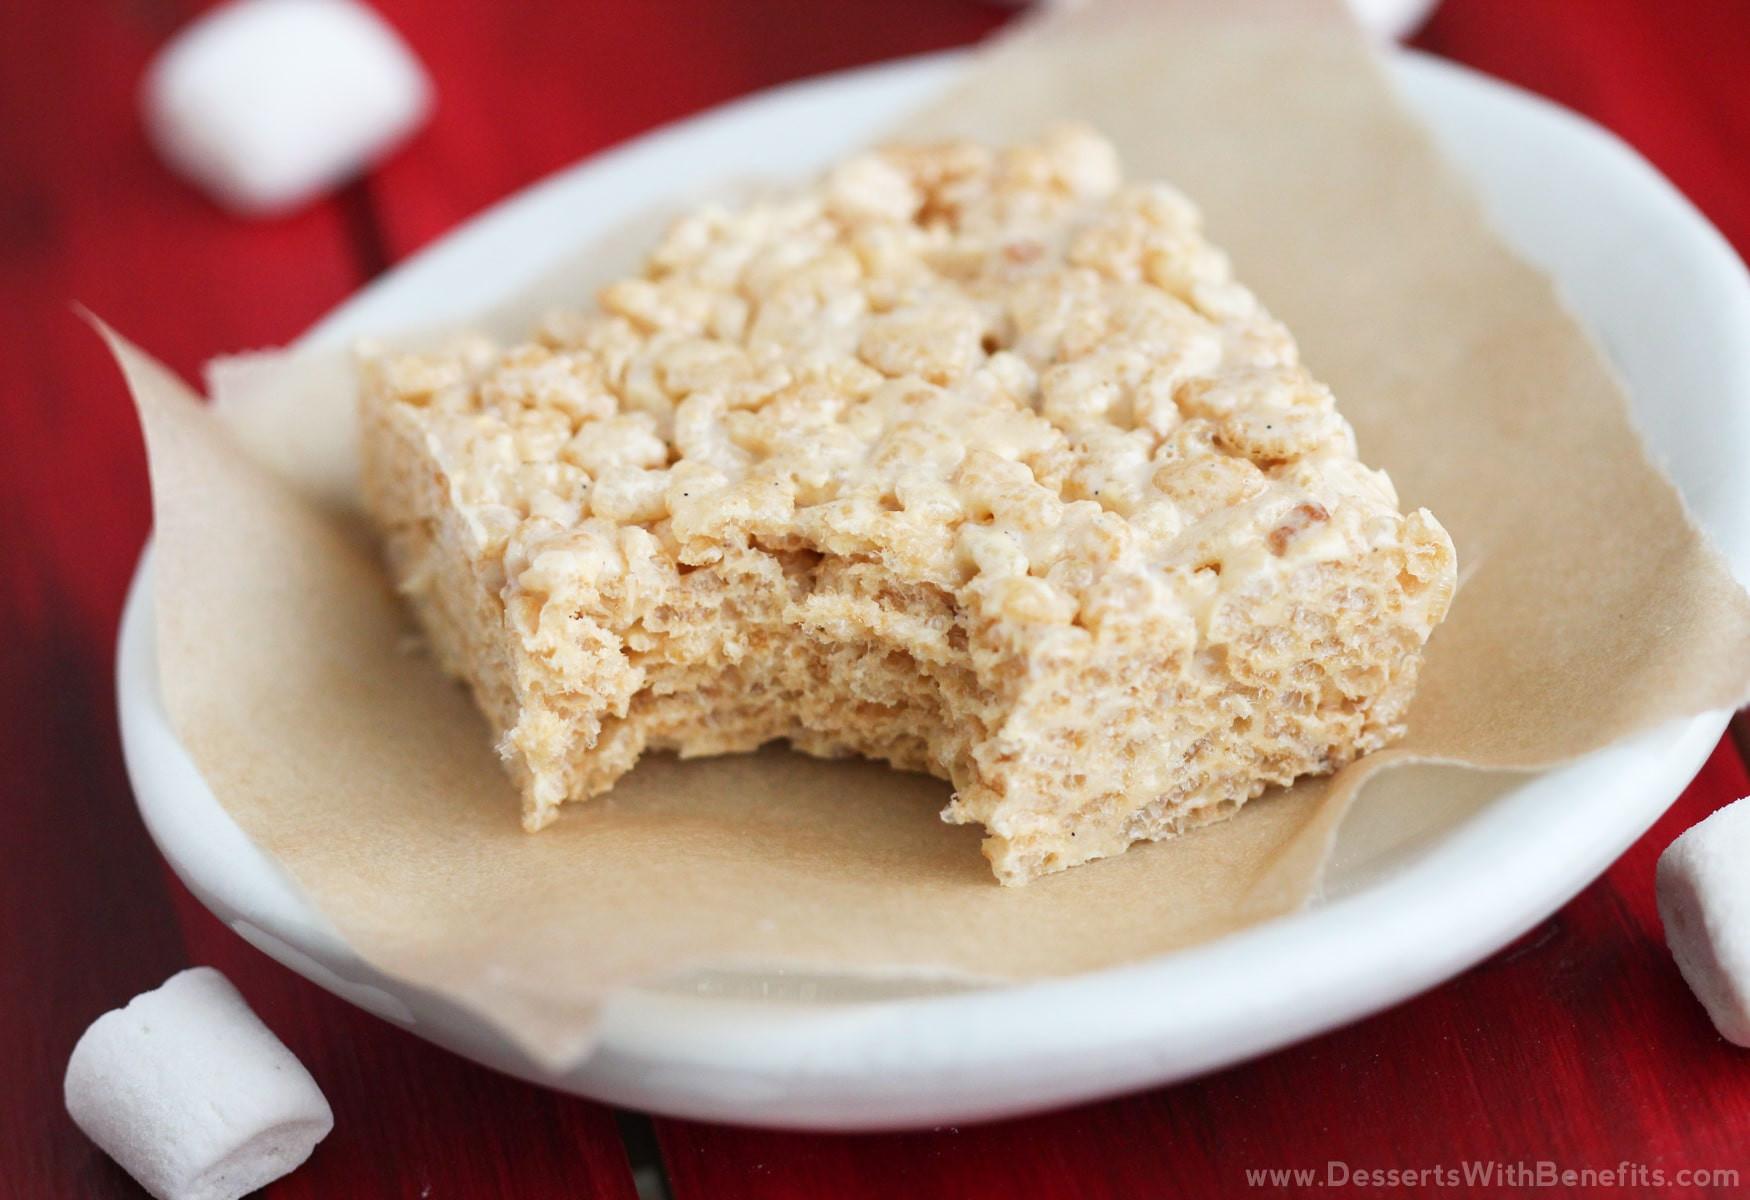 Easy Healthy Dessert  Healthy Gluten Free Protein Krispy Treats Recipe